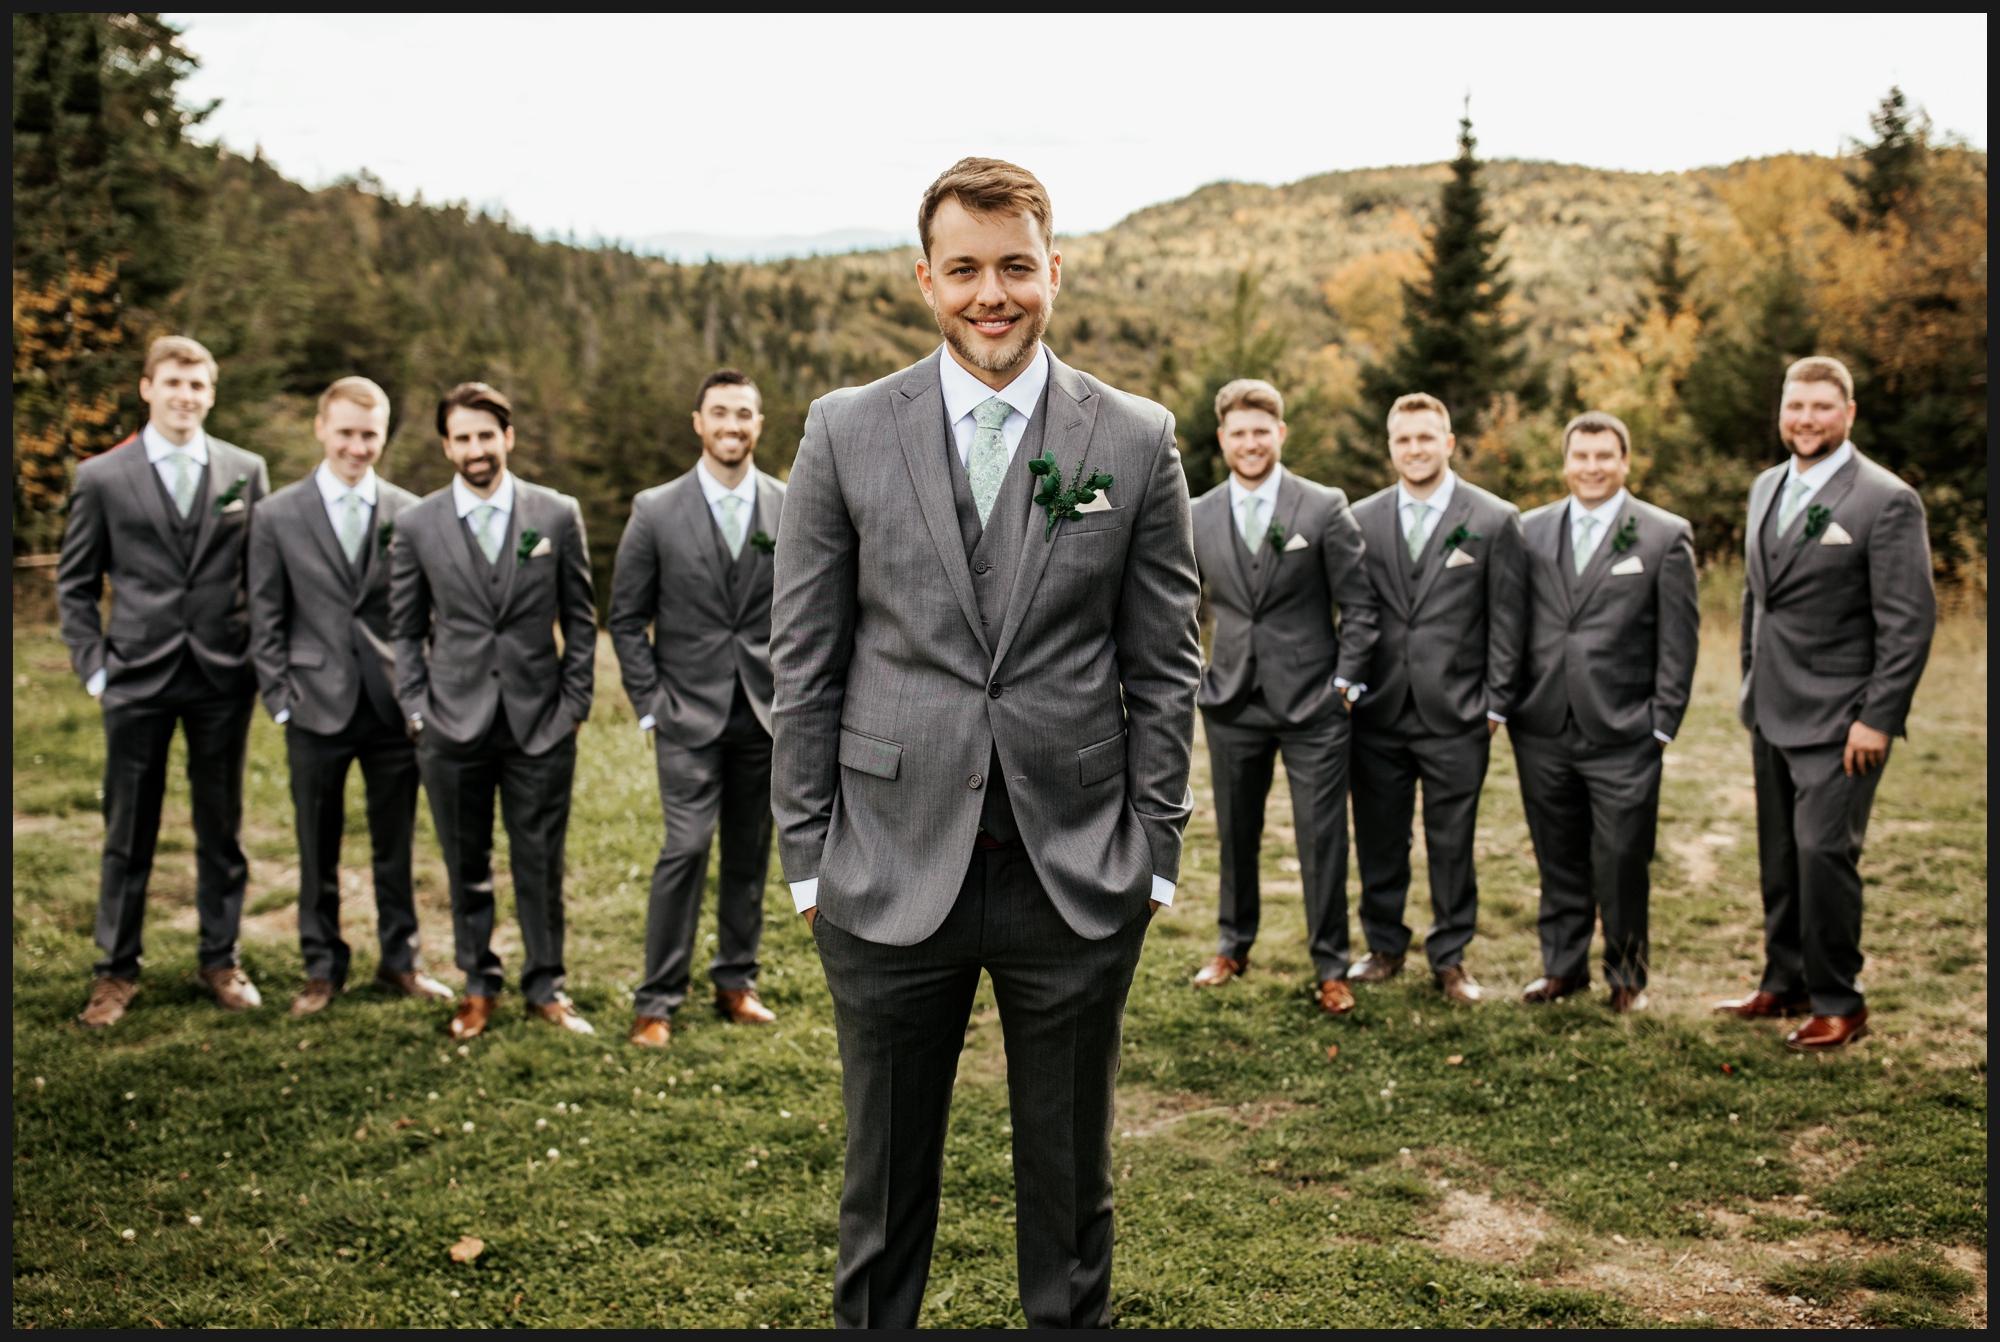 Orlando-Wedding-Photographer-destination-wedding-photographer-florida-wedding-photographer-hawaii-wedding-photographer_0153.jpg